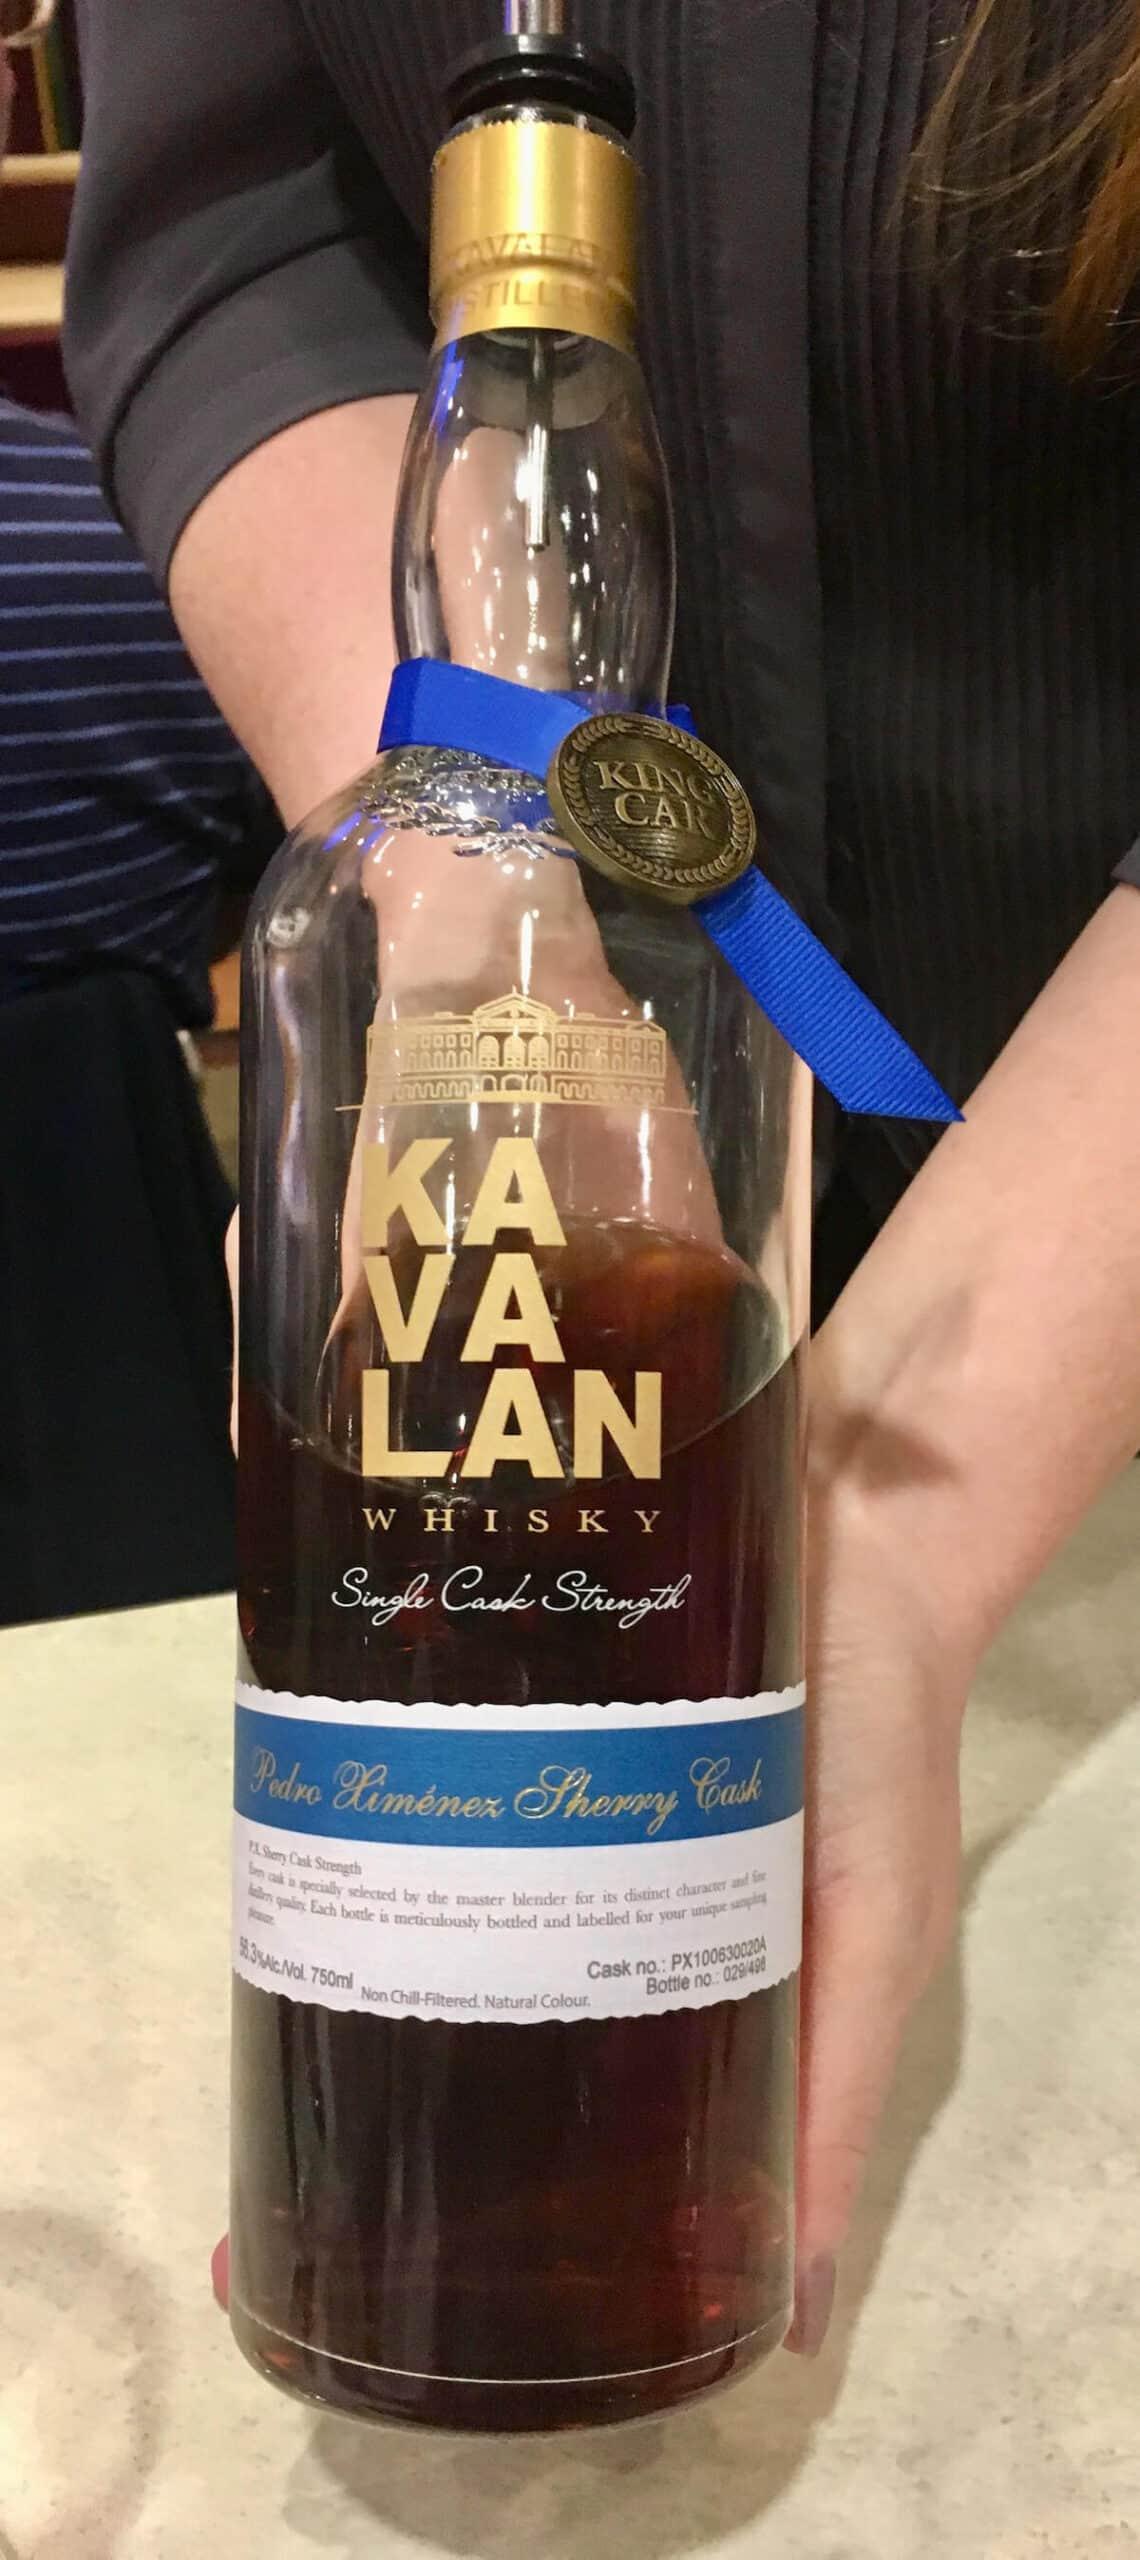 Kavalan Pedro Ximenez Sherry Cask whisky bottle.